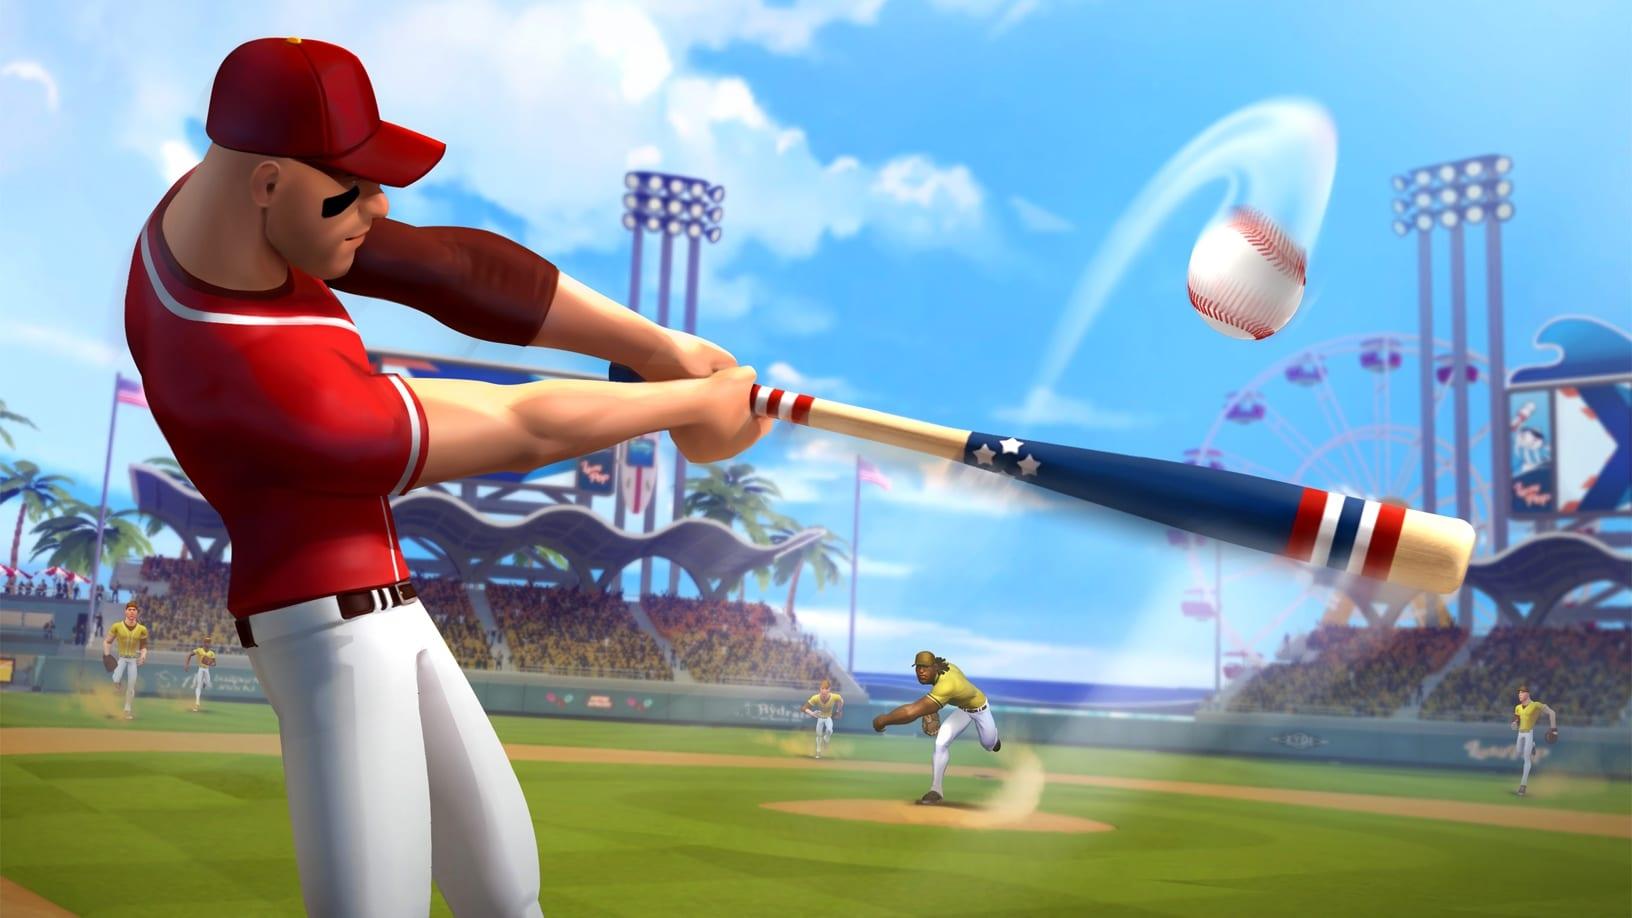 Apple Apple Arcade Ballistic Baseball 091019 - Výber z ponuky Apple Arcade